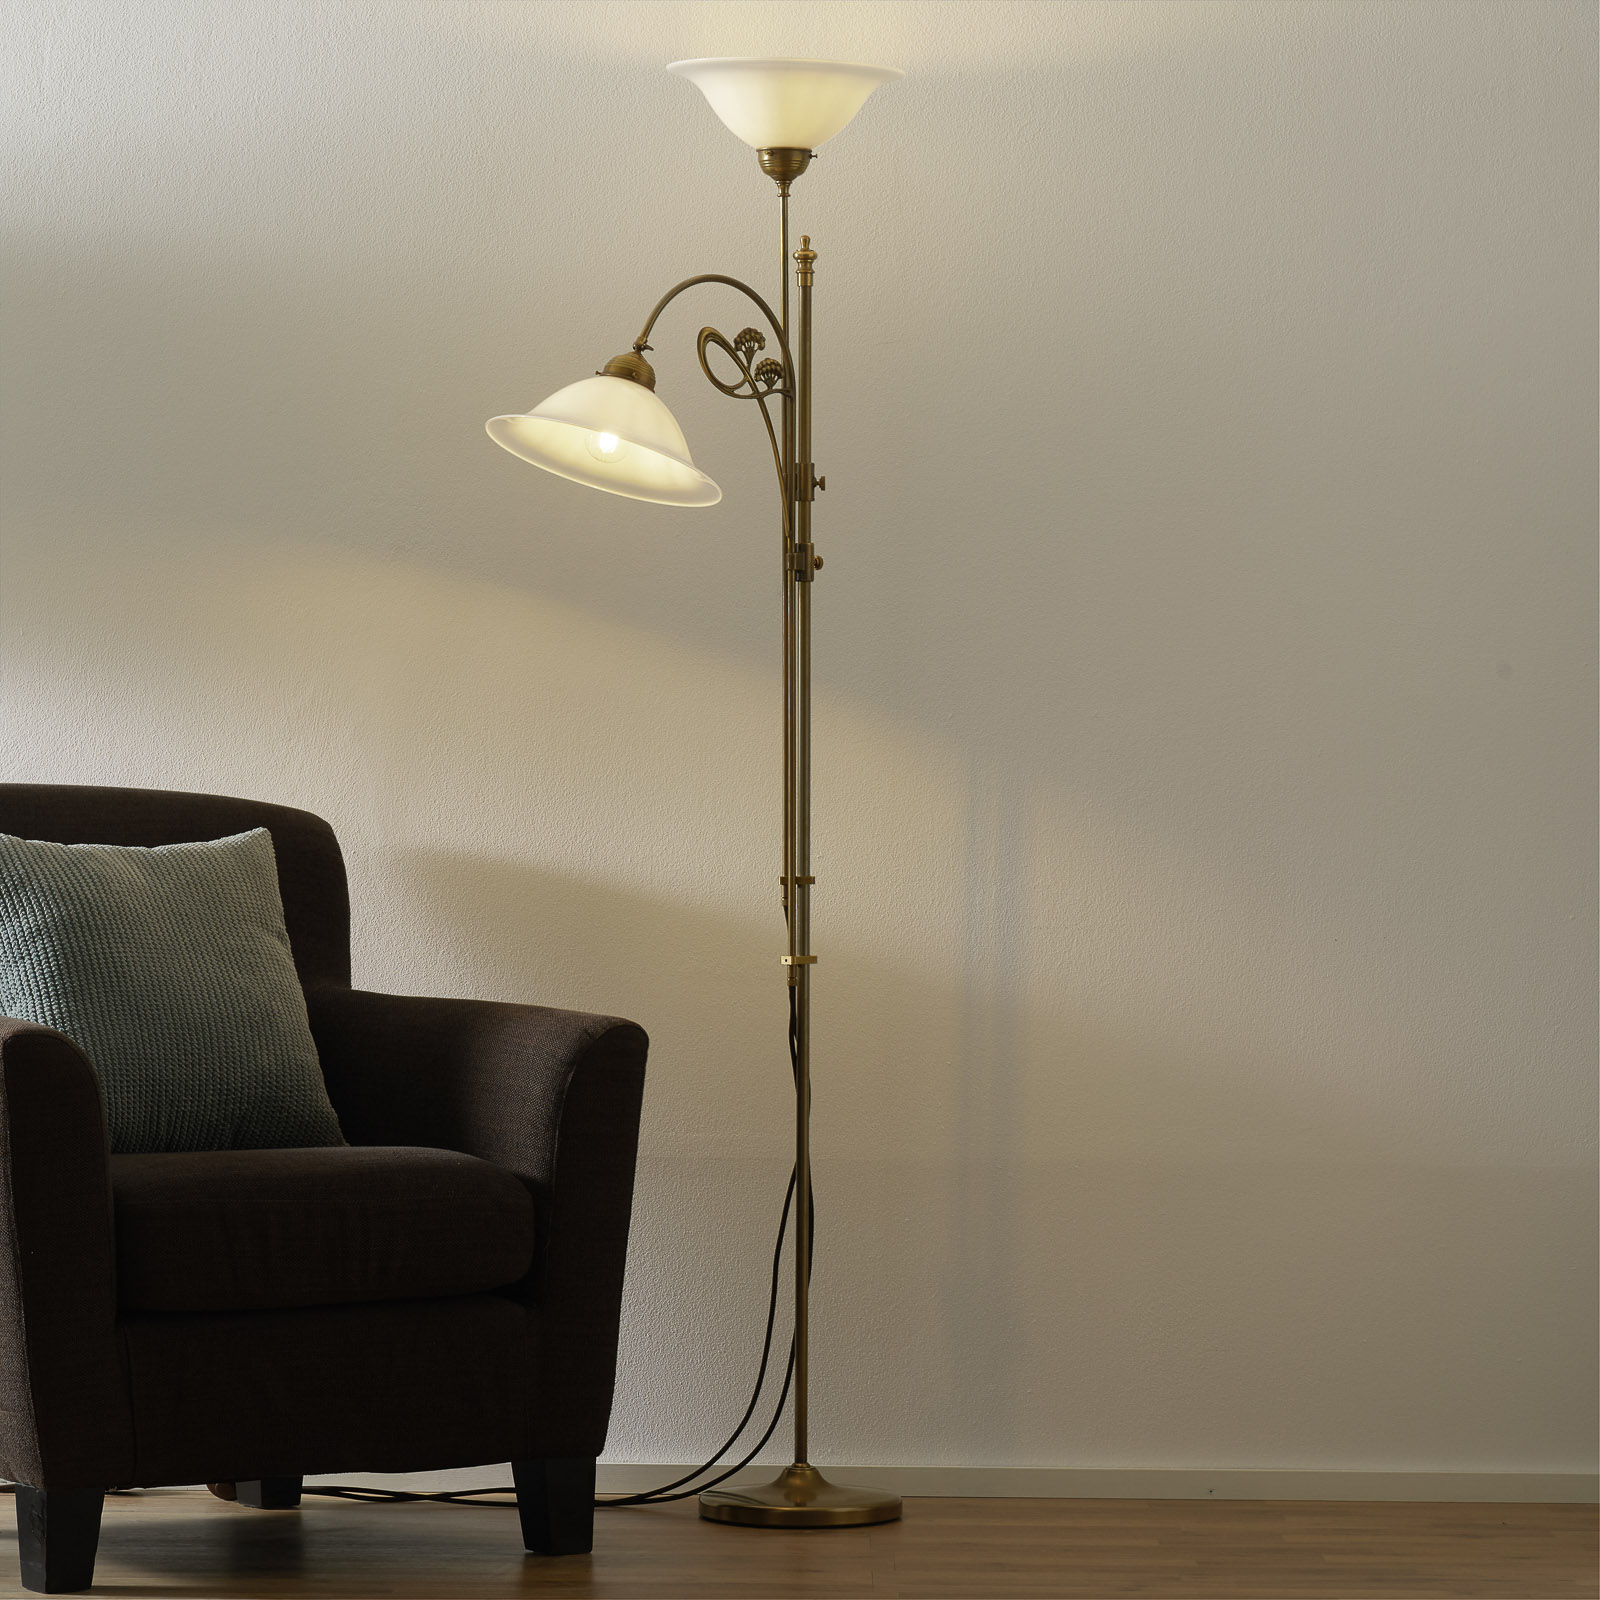 Alwine brass floor lamp two-bulb_1542009_1